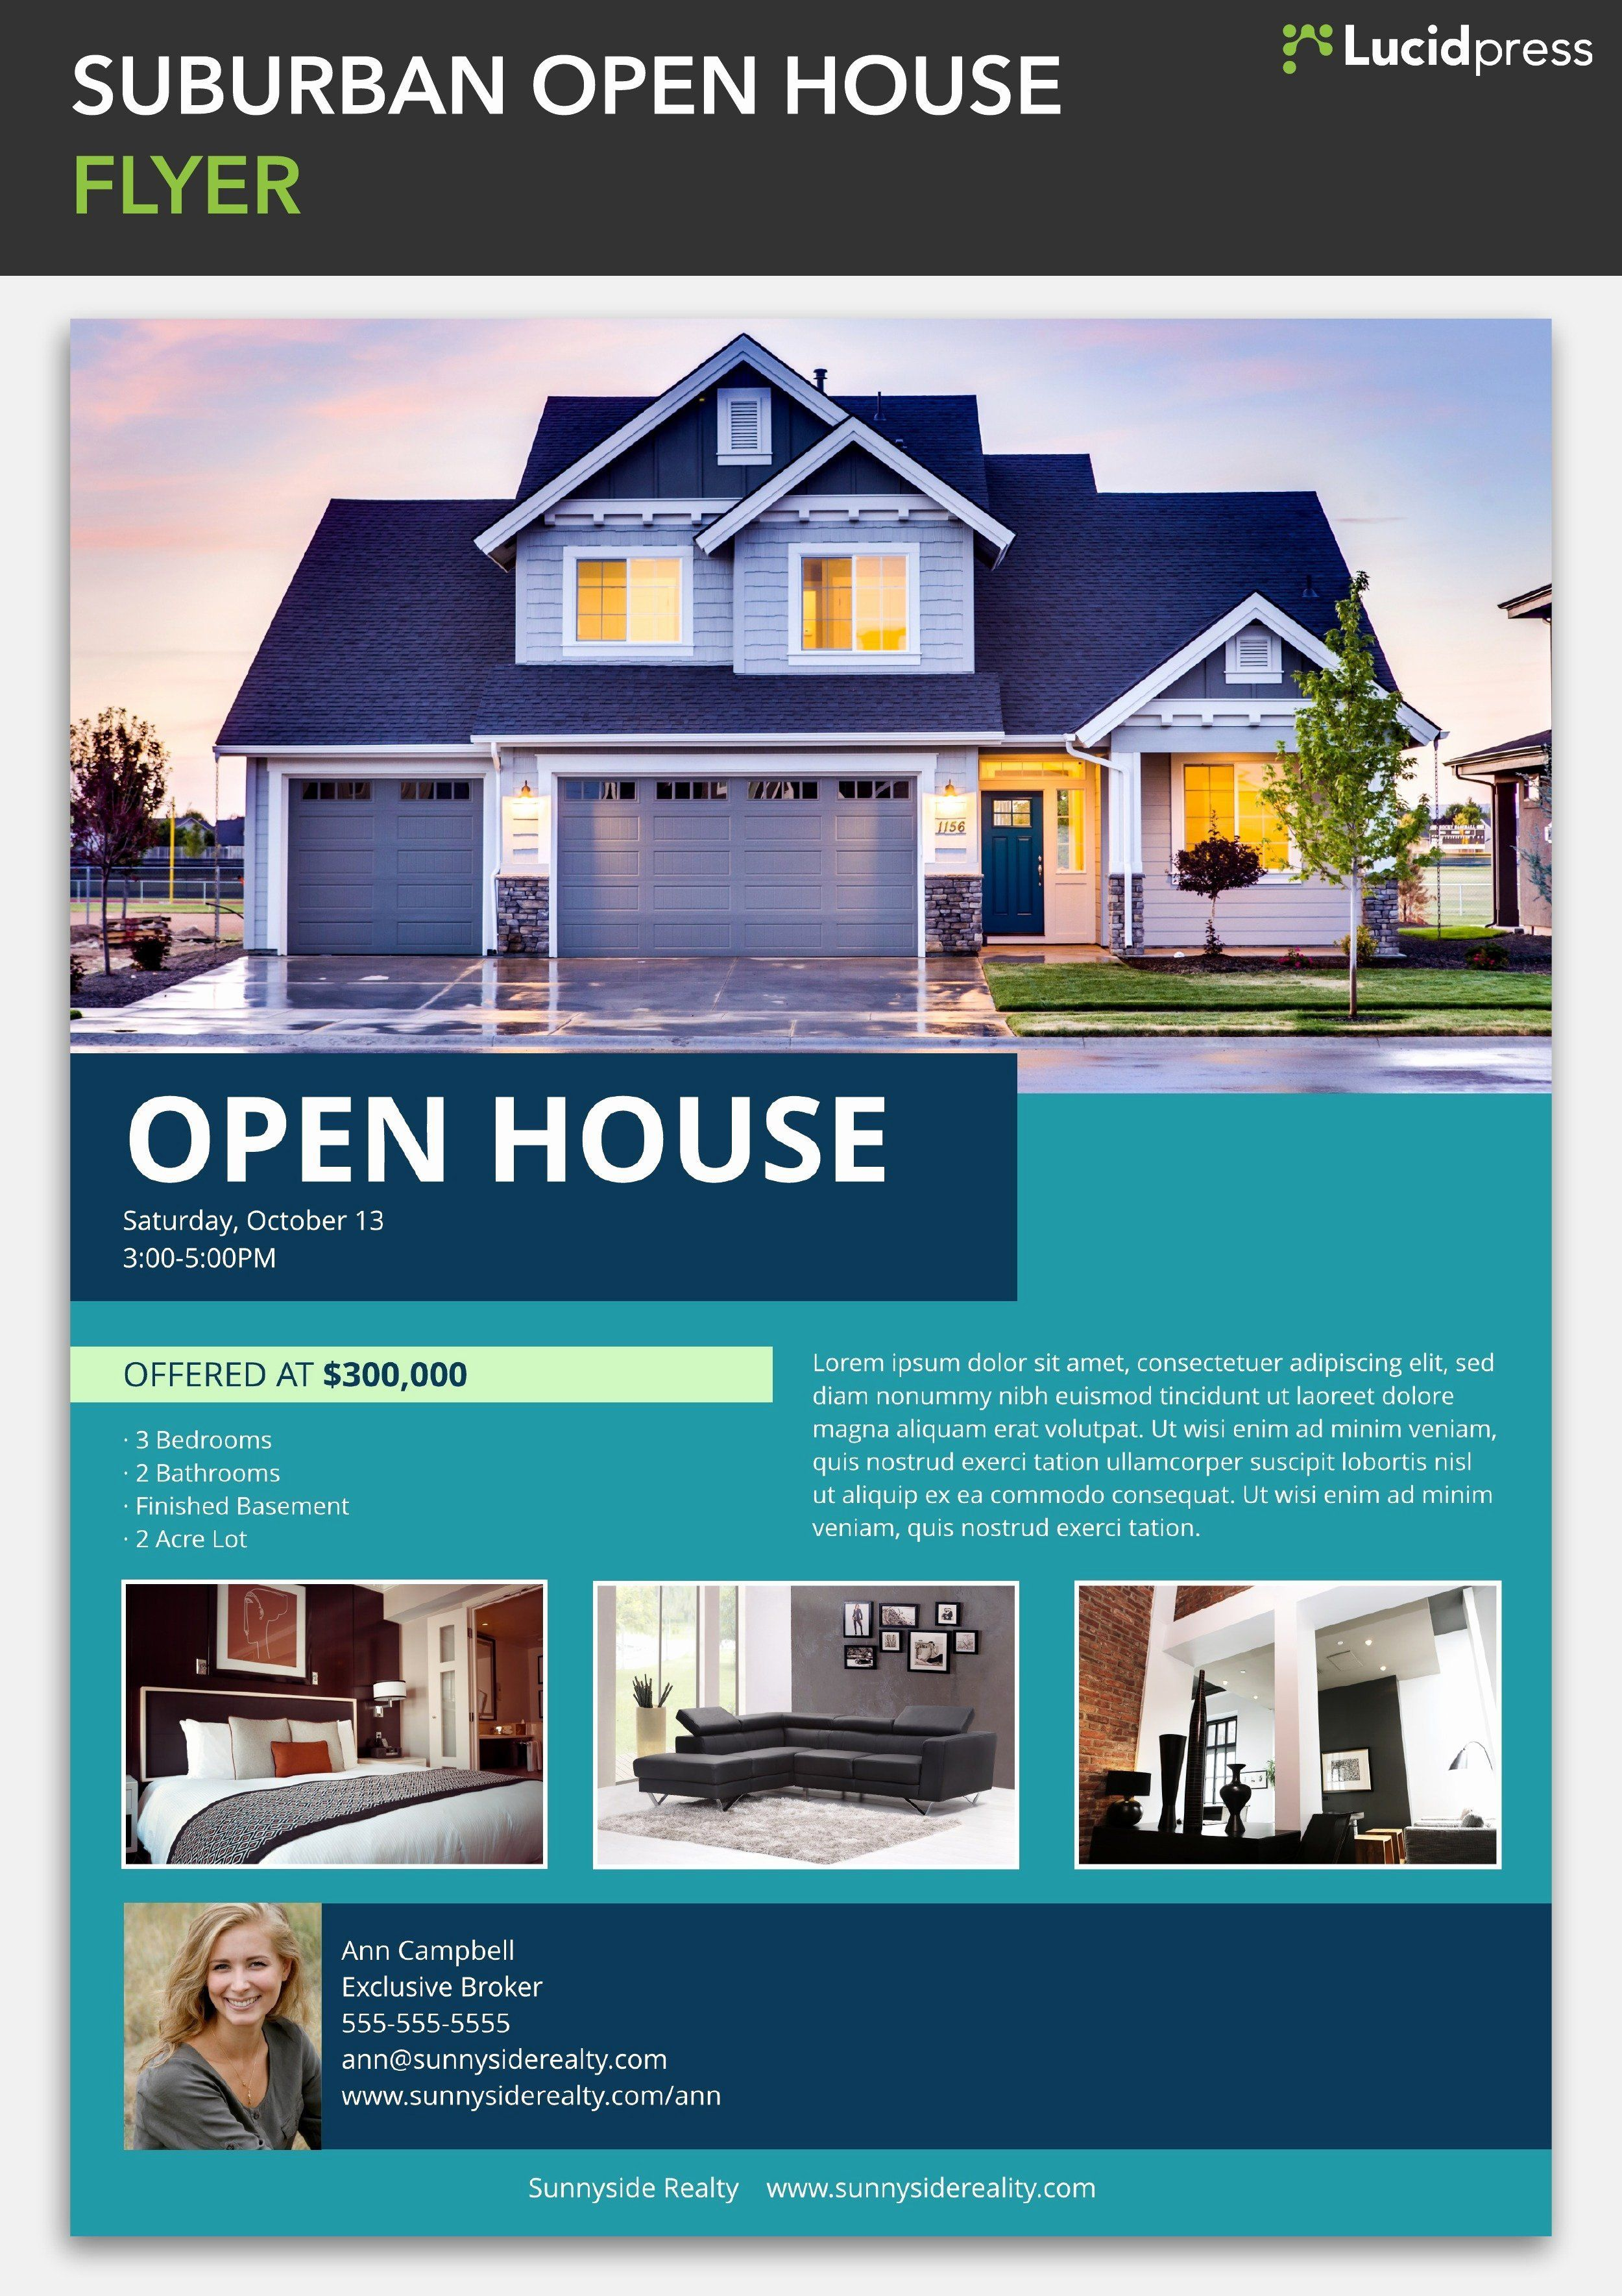 001 Unusual Open House Flyer Template Free Idea  Holiday Preschool School MicrosoftFull